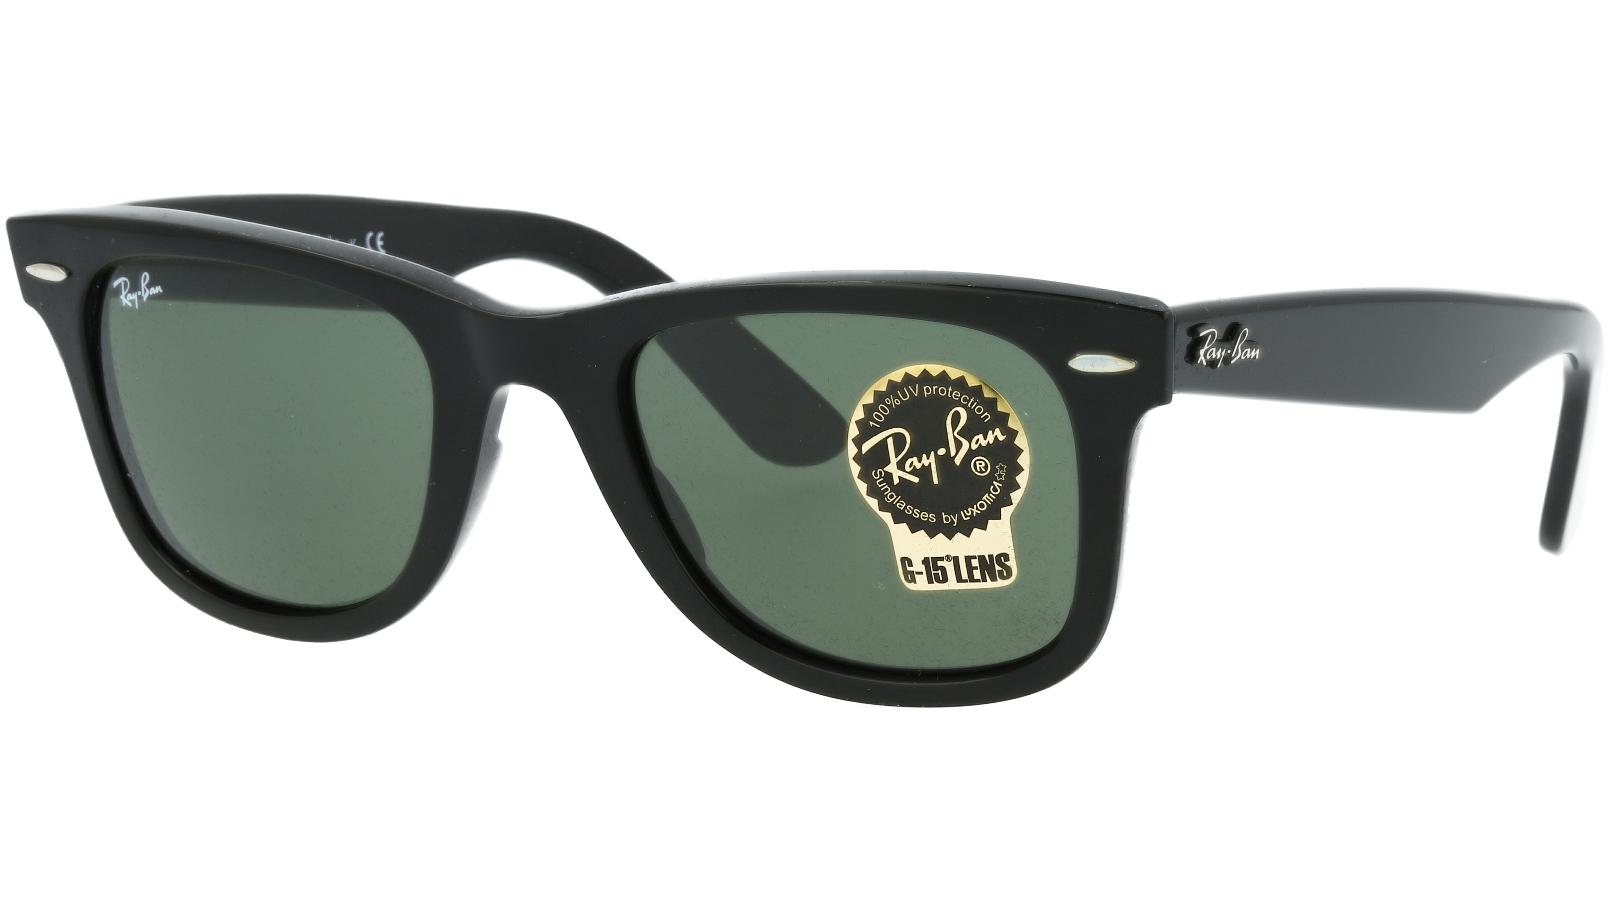 Ray-Ban RB2140 901 50 Black Sunglasses